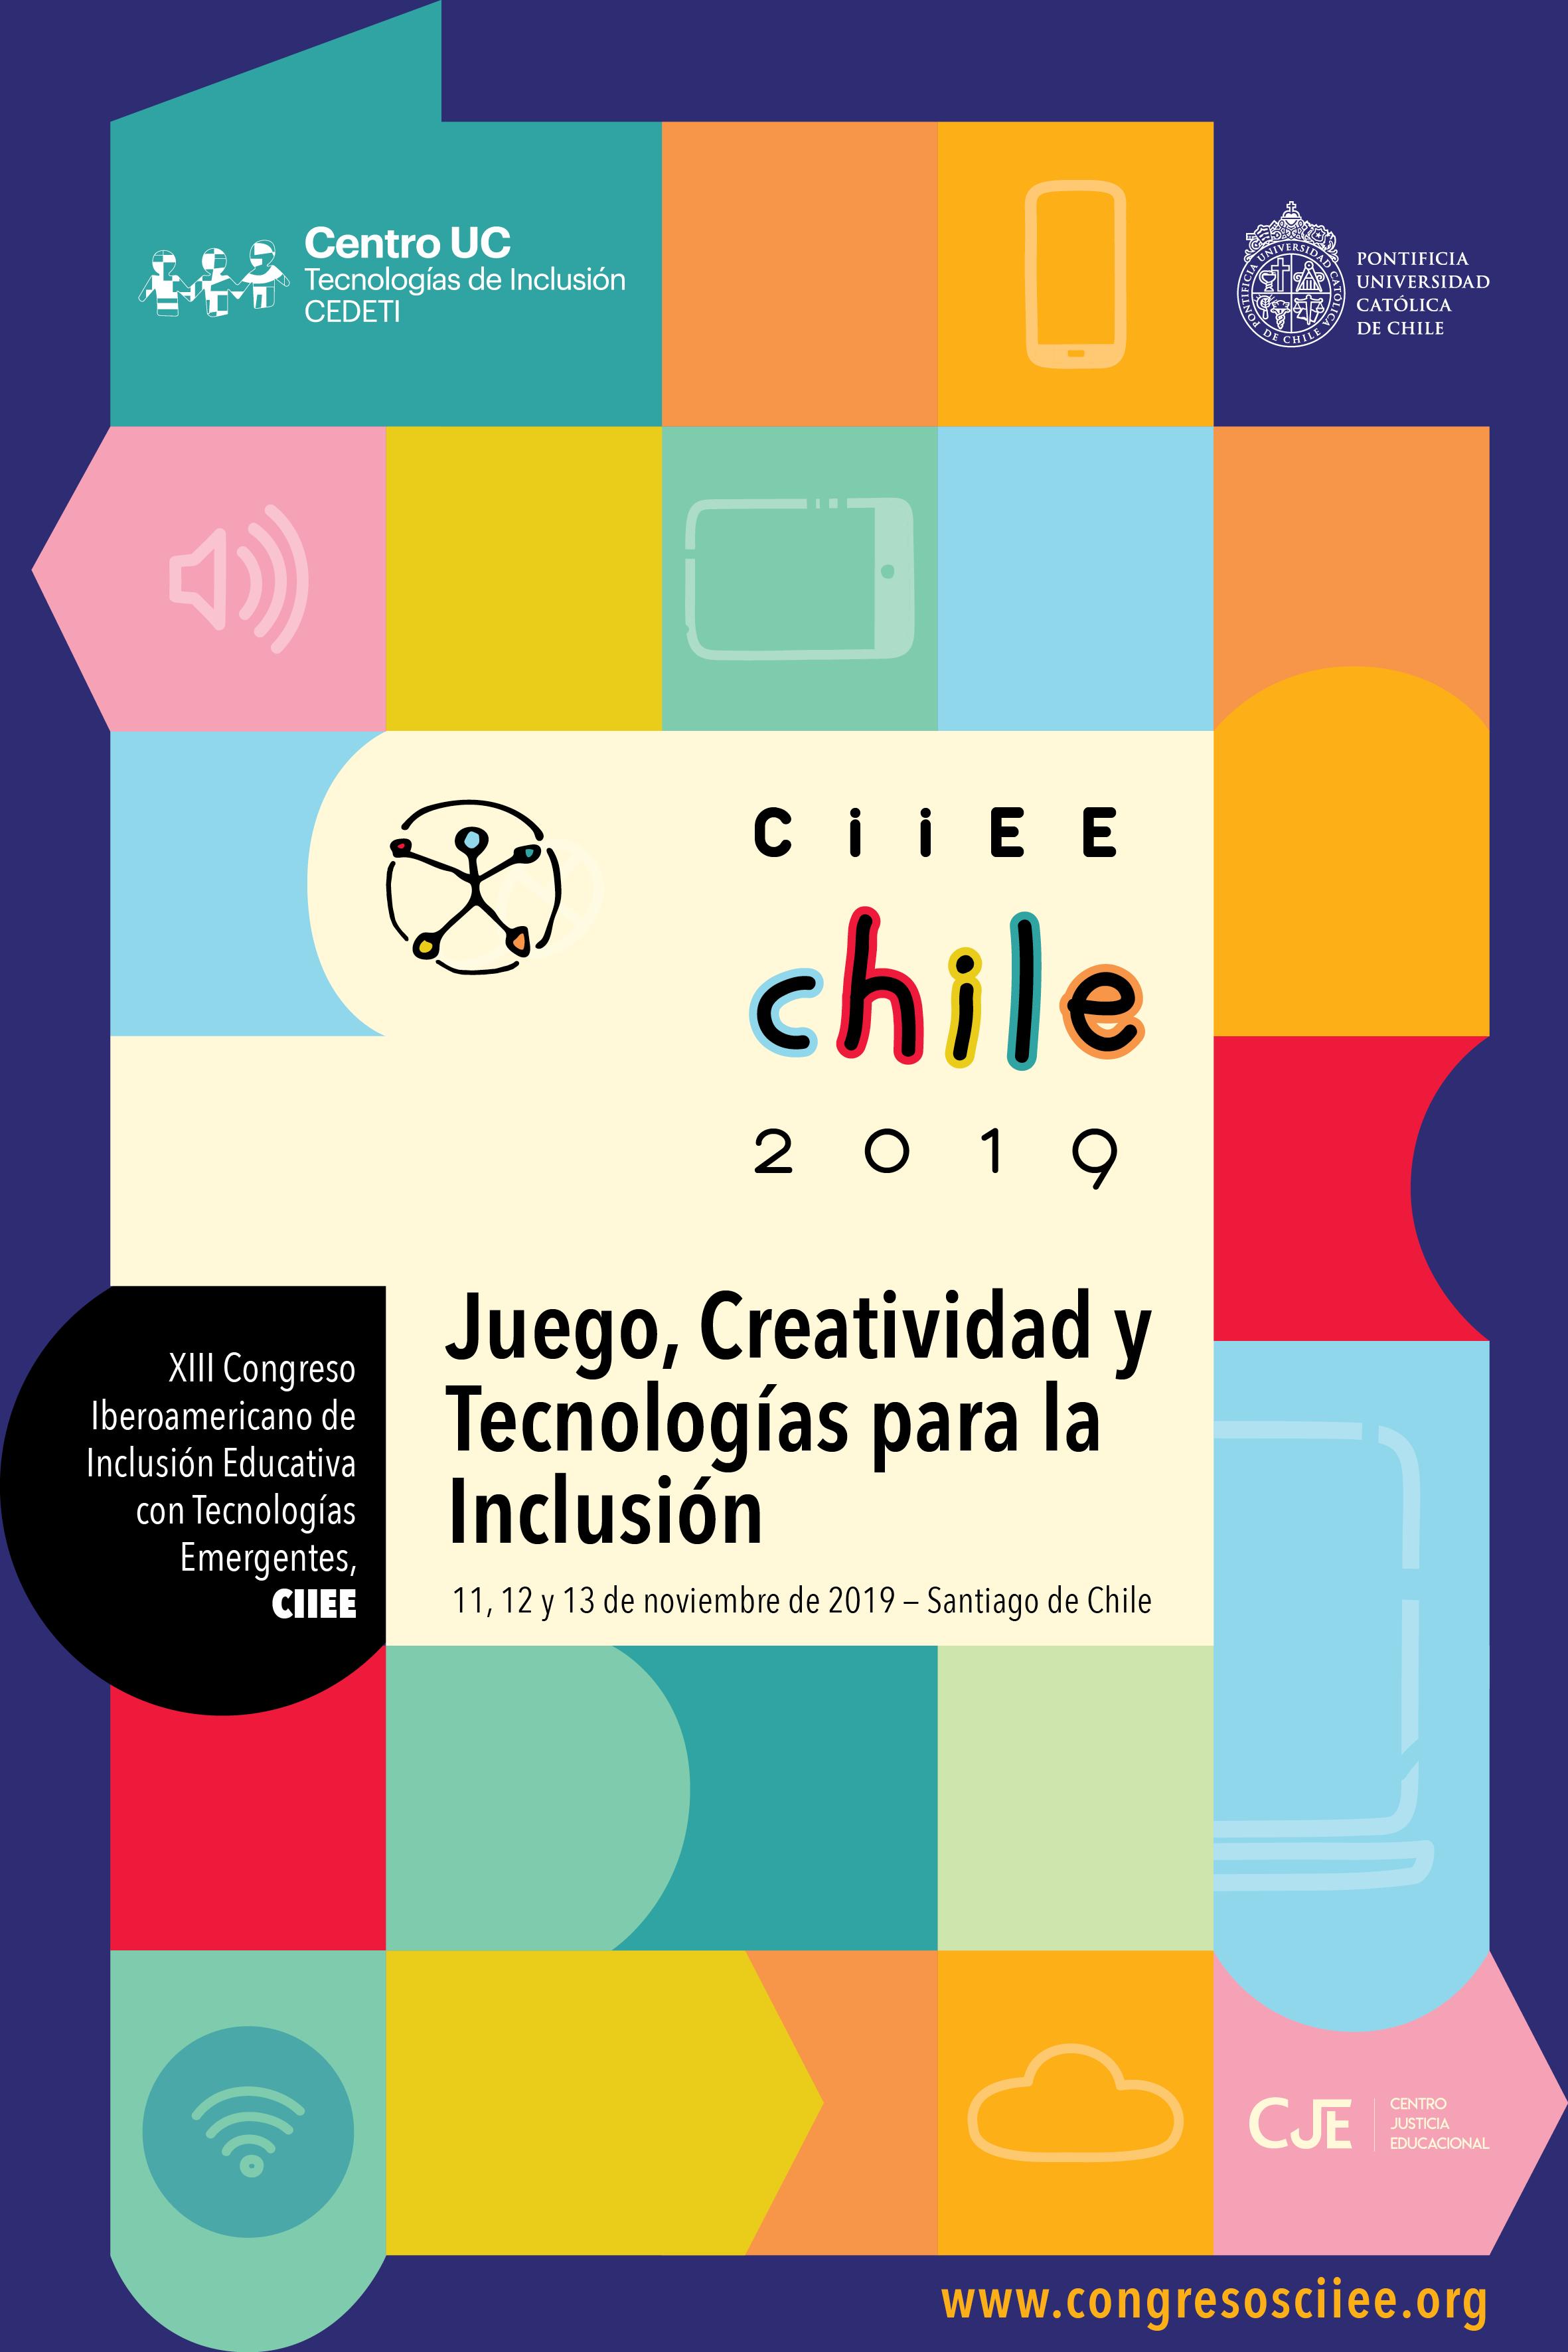 Afiche del Congreso CIIEE 2019